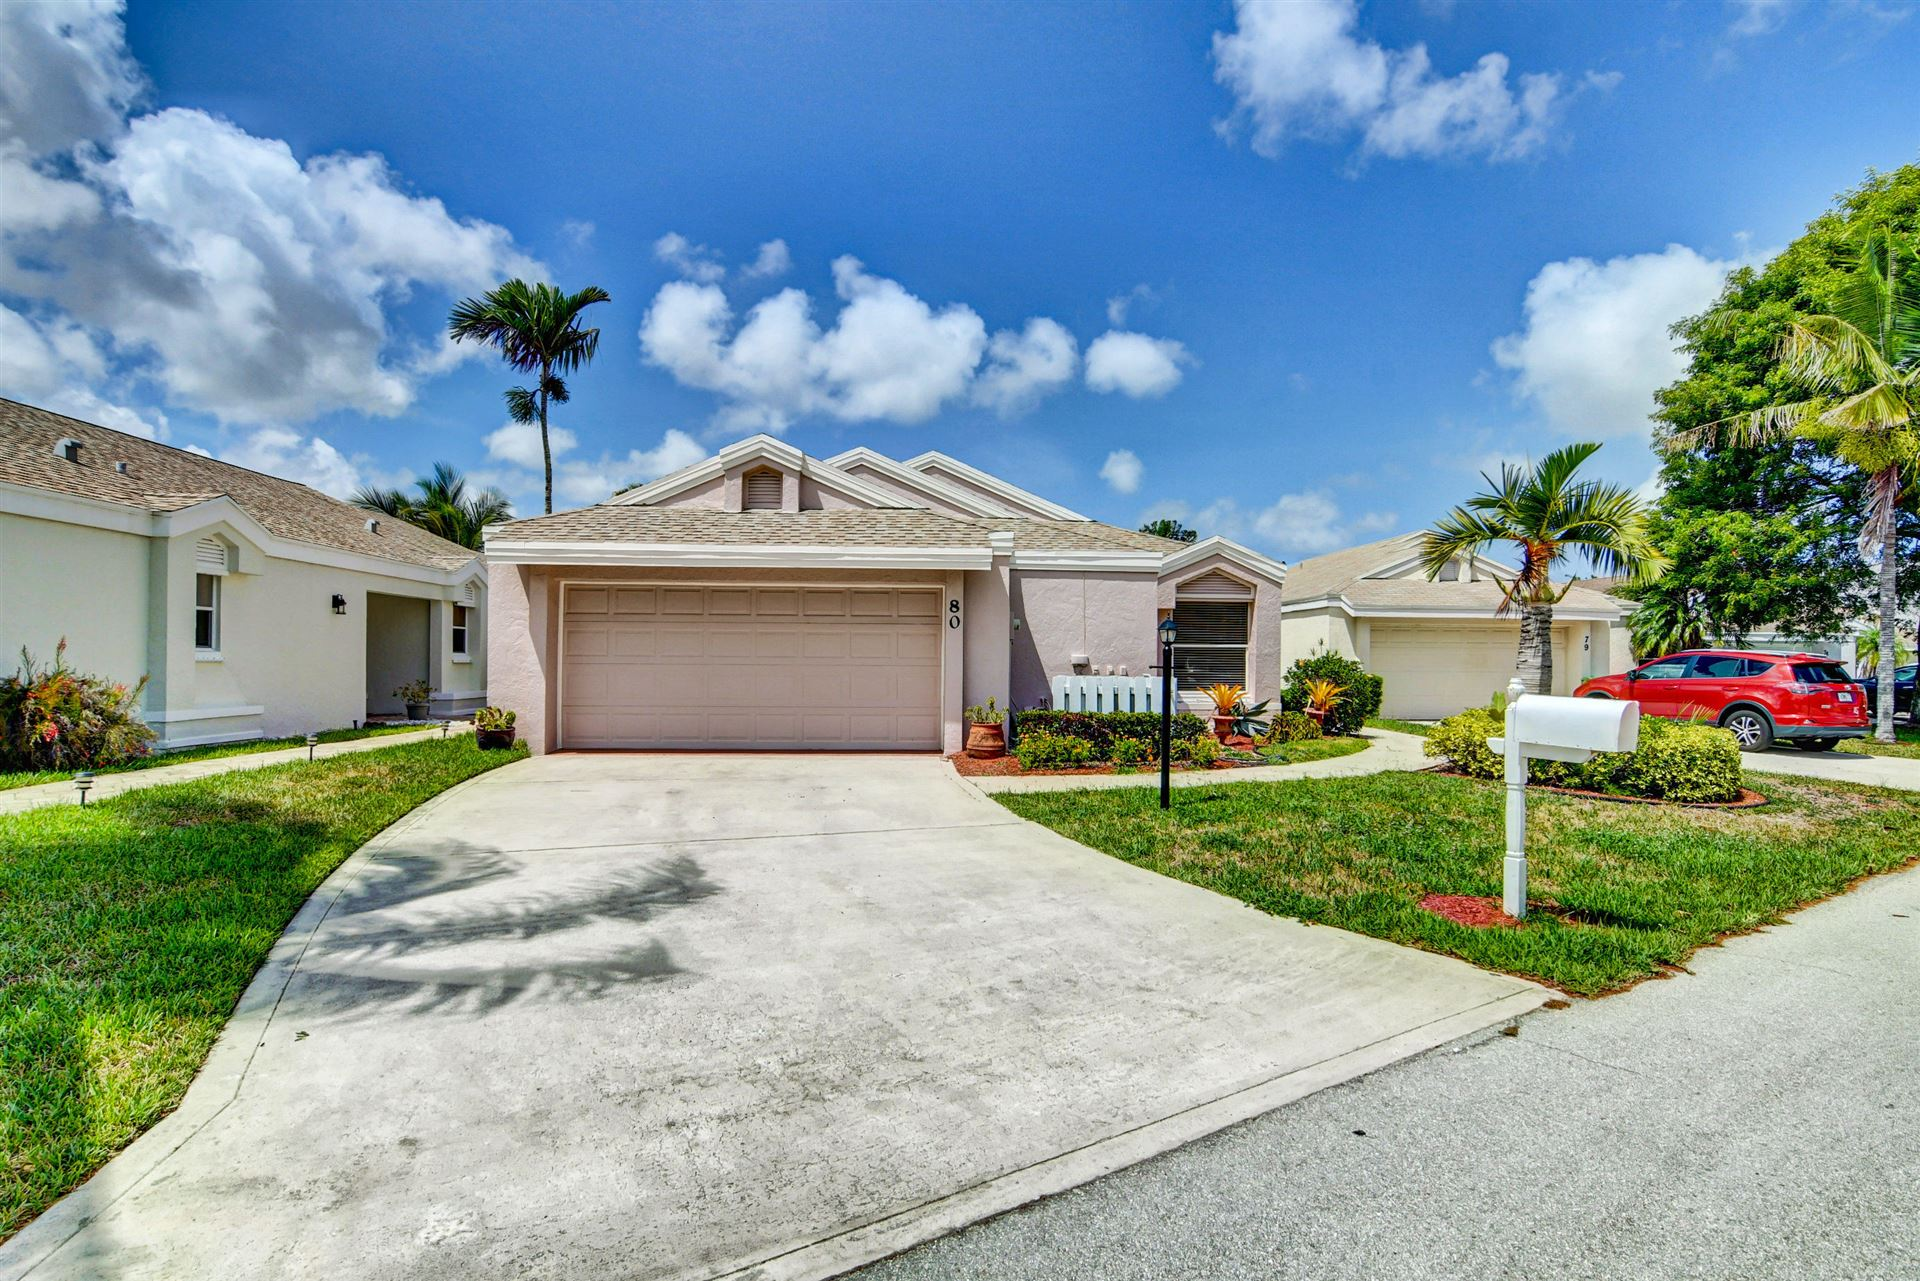 80 Sandpiper Way Way, Boynton Beach, FL 33436 - MLS#: RX-10723238